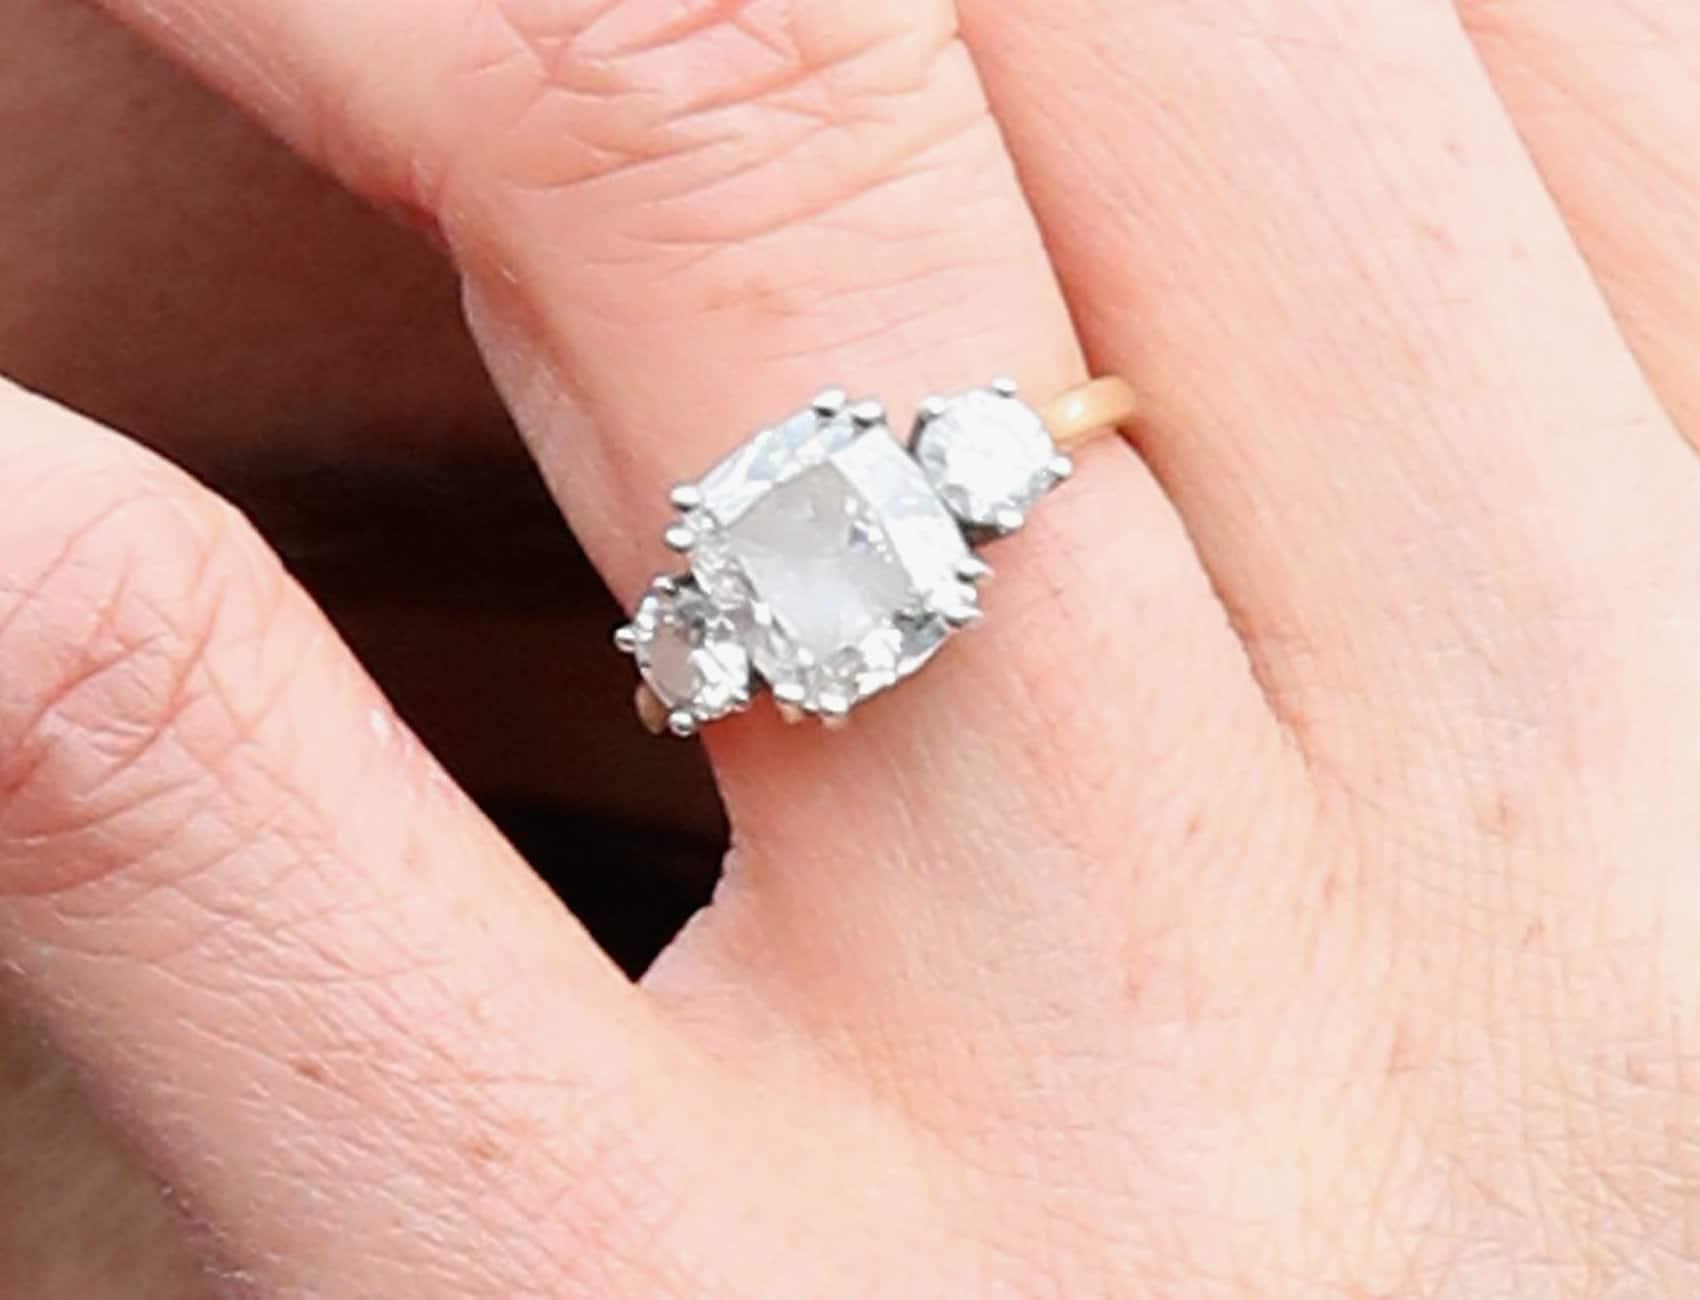 Meghan Markle Diamond Ring